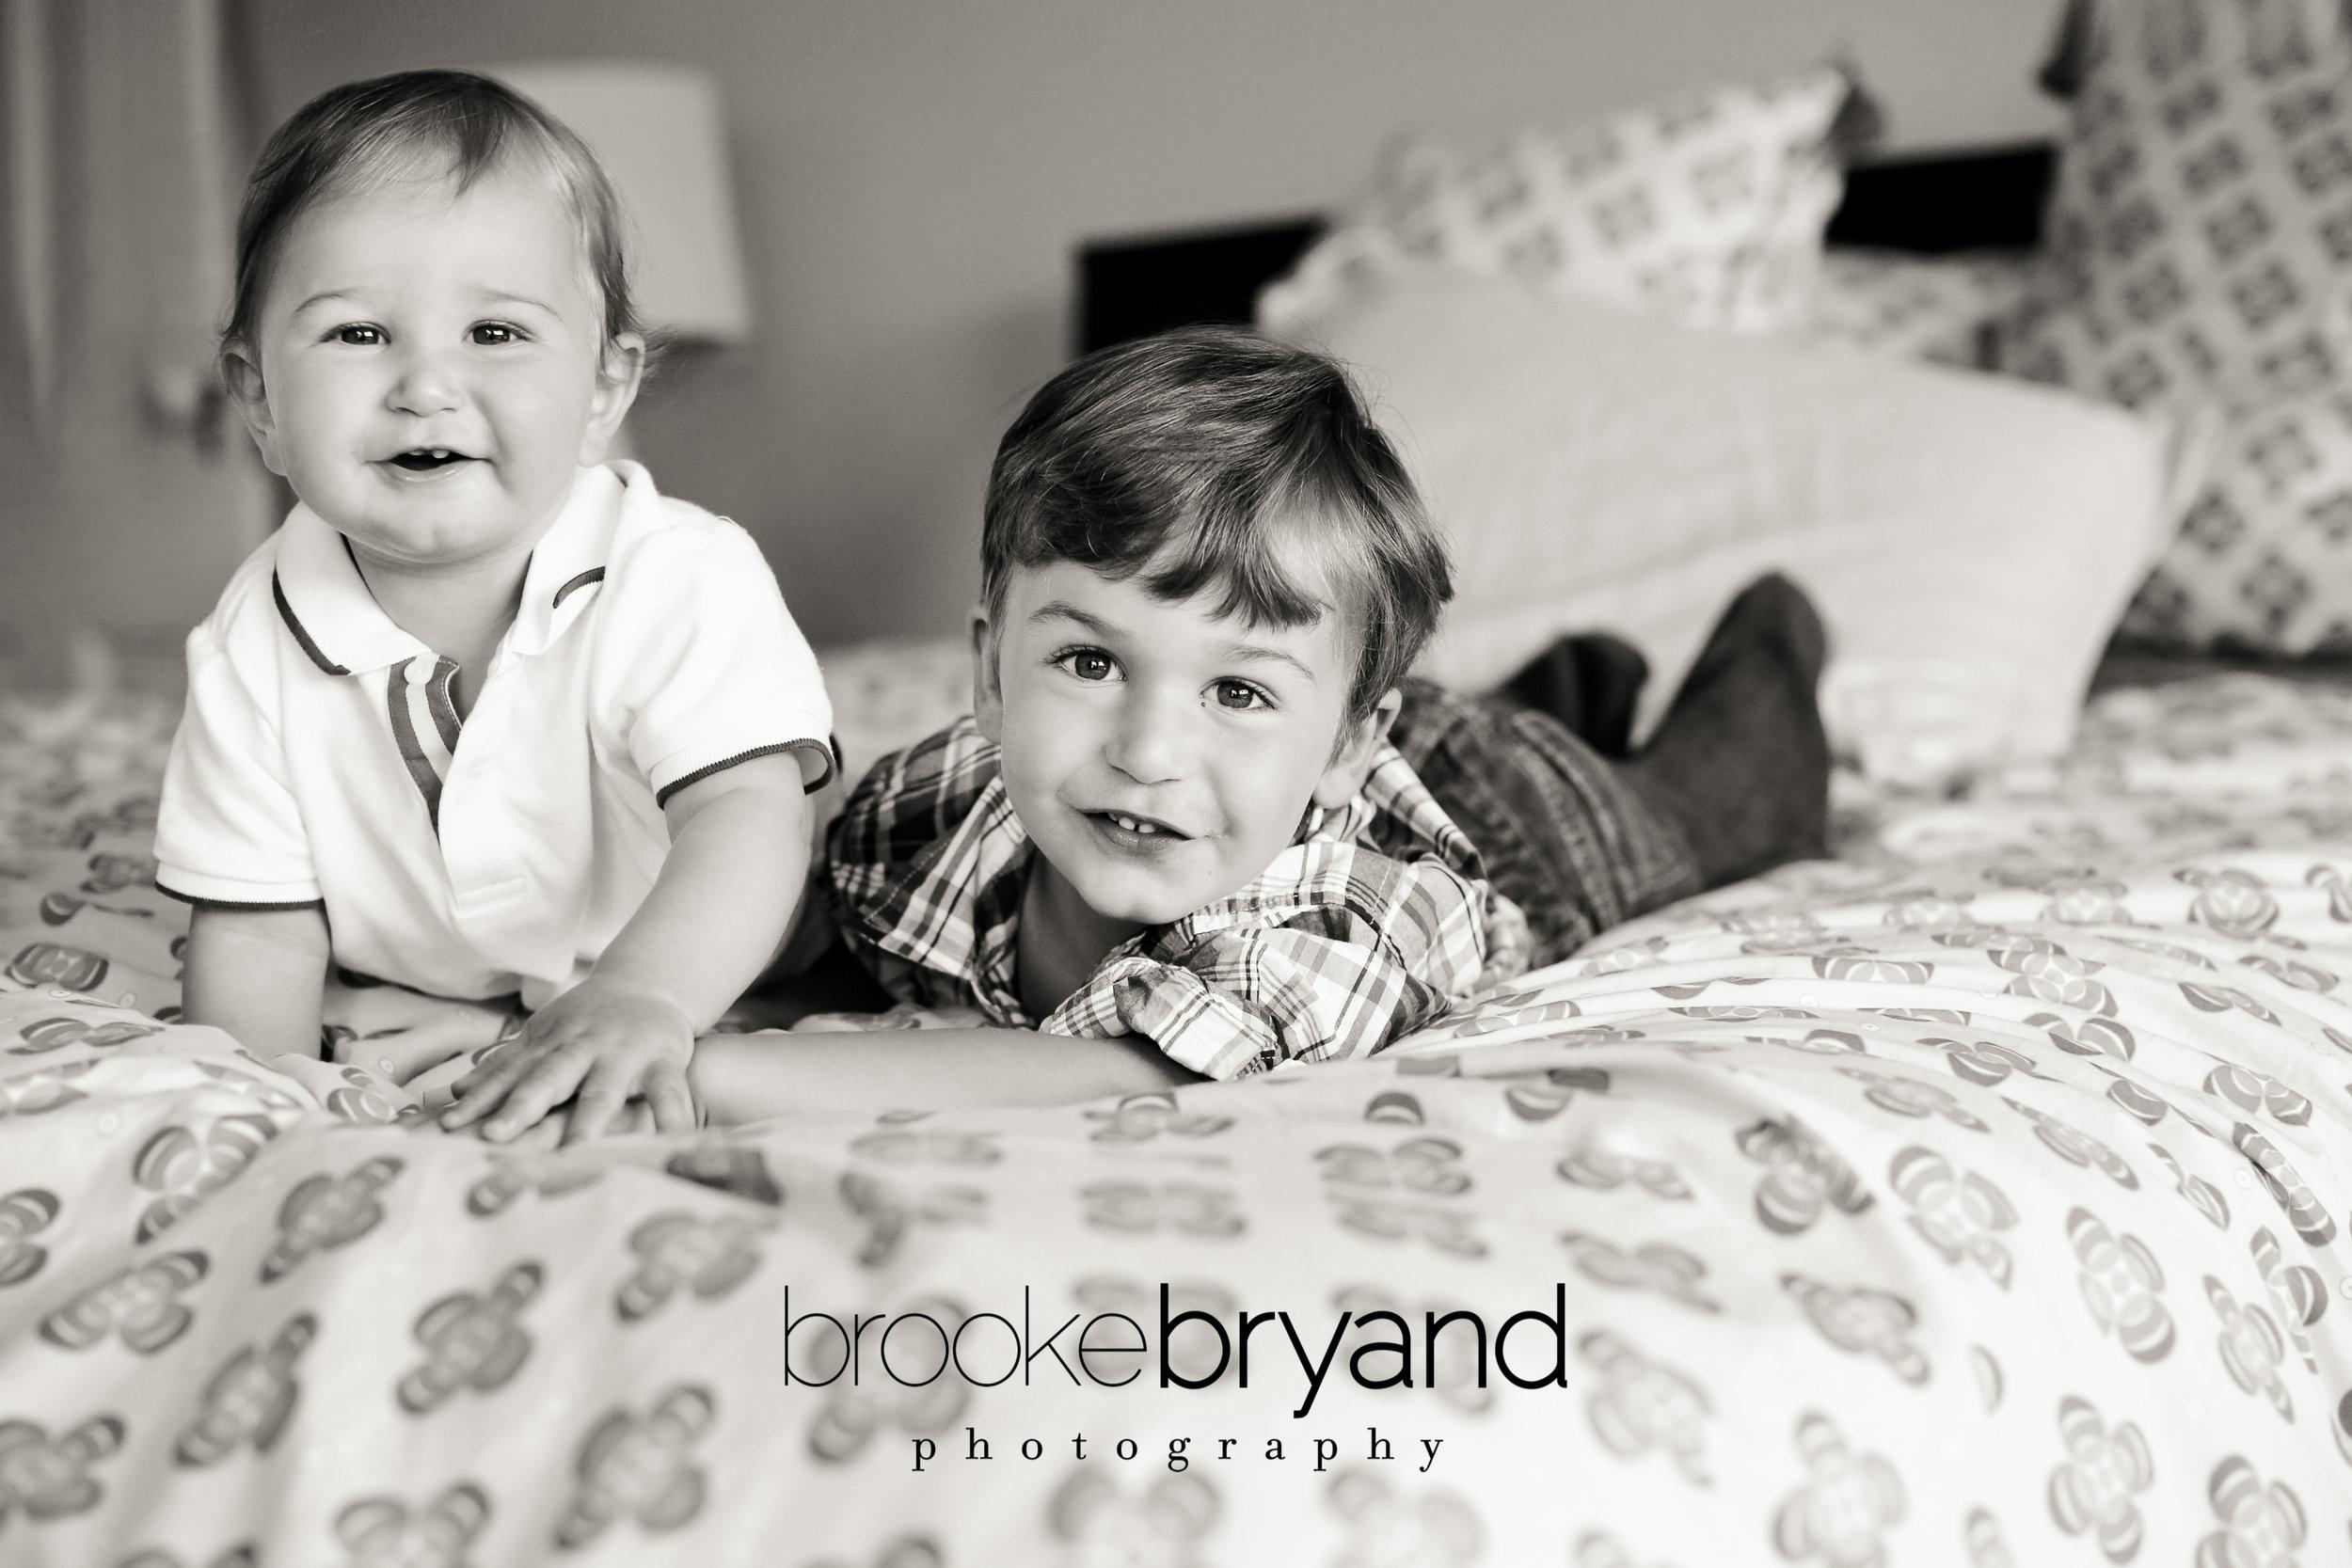 08.2013-Pasq-Brooke-Bryand-Photography-San-Francisco-Family-Photographer-Palace-of-Fine-Arts-Family-Photos-IMGL0677_retouch.jpg